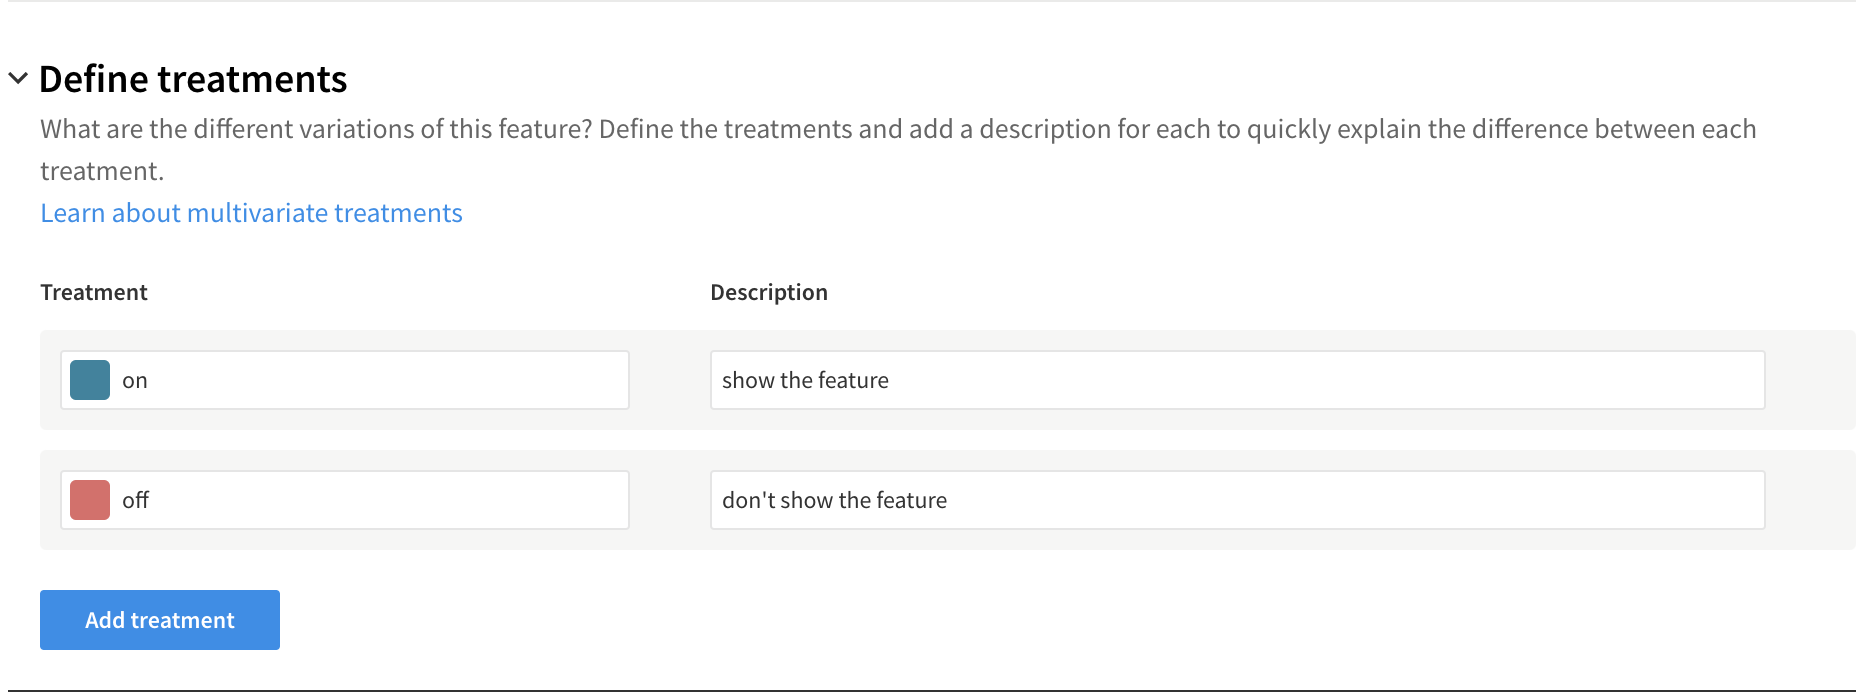 Define treatments